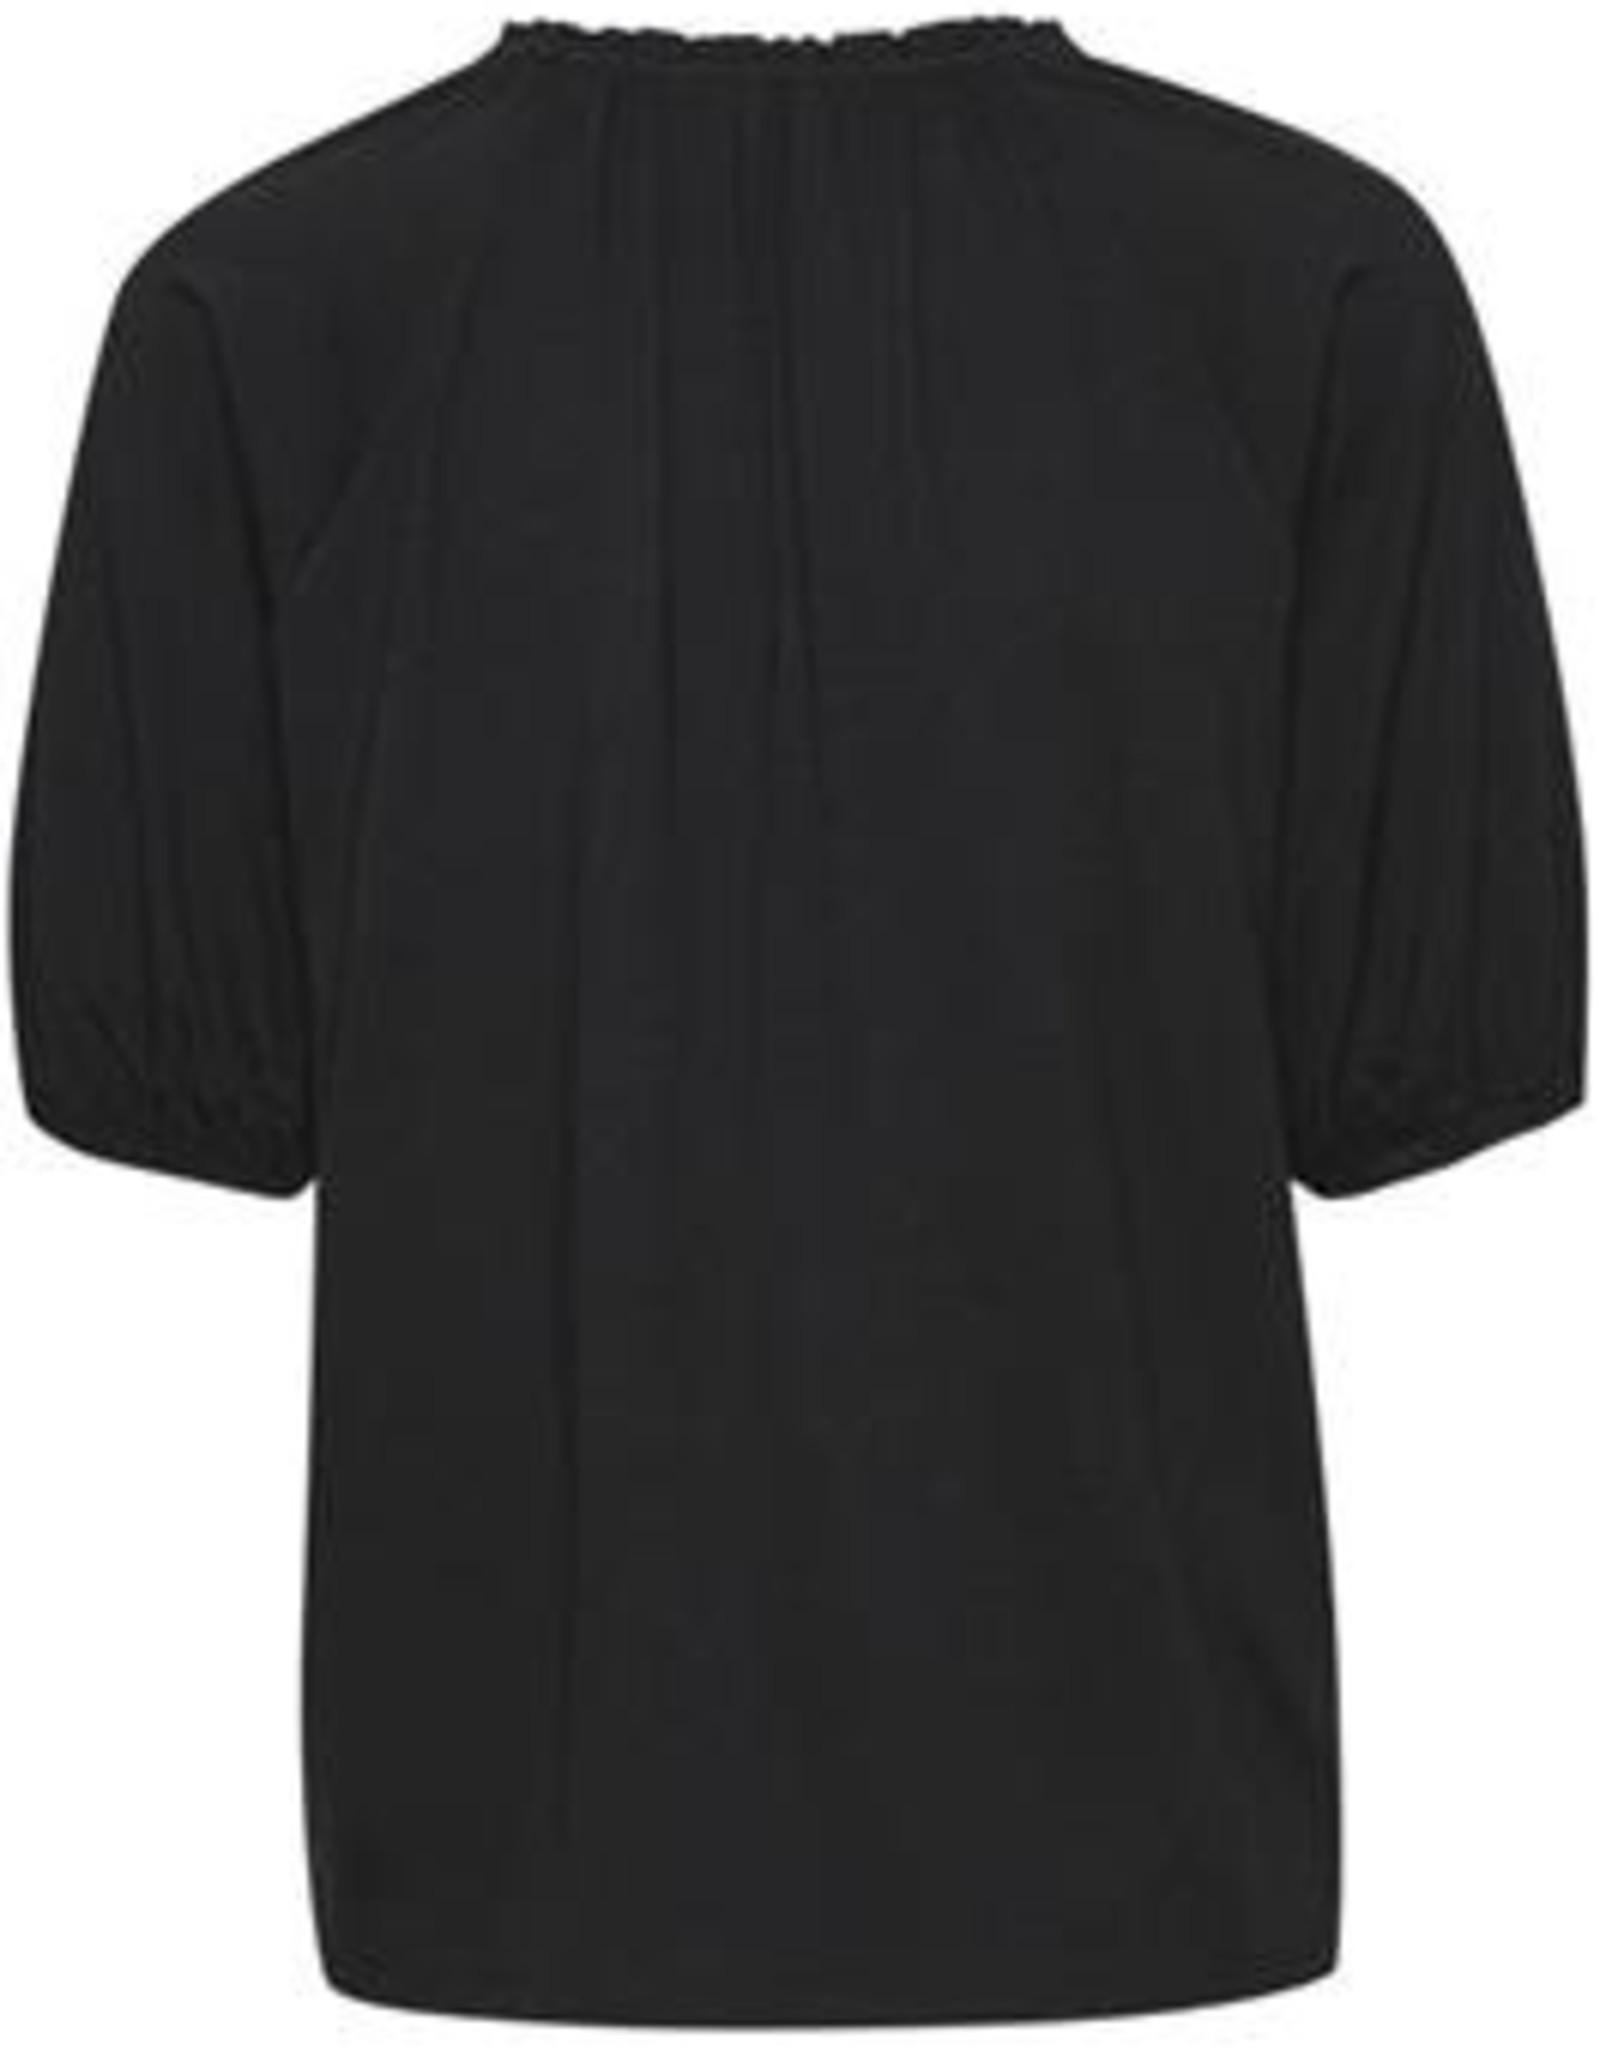 InWear Kaisa Abbey Blouse Black